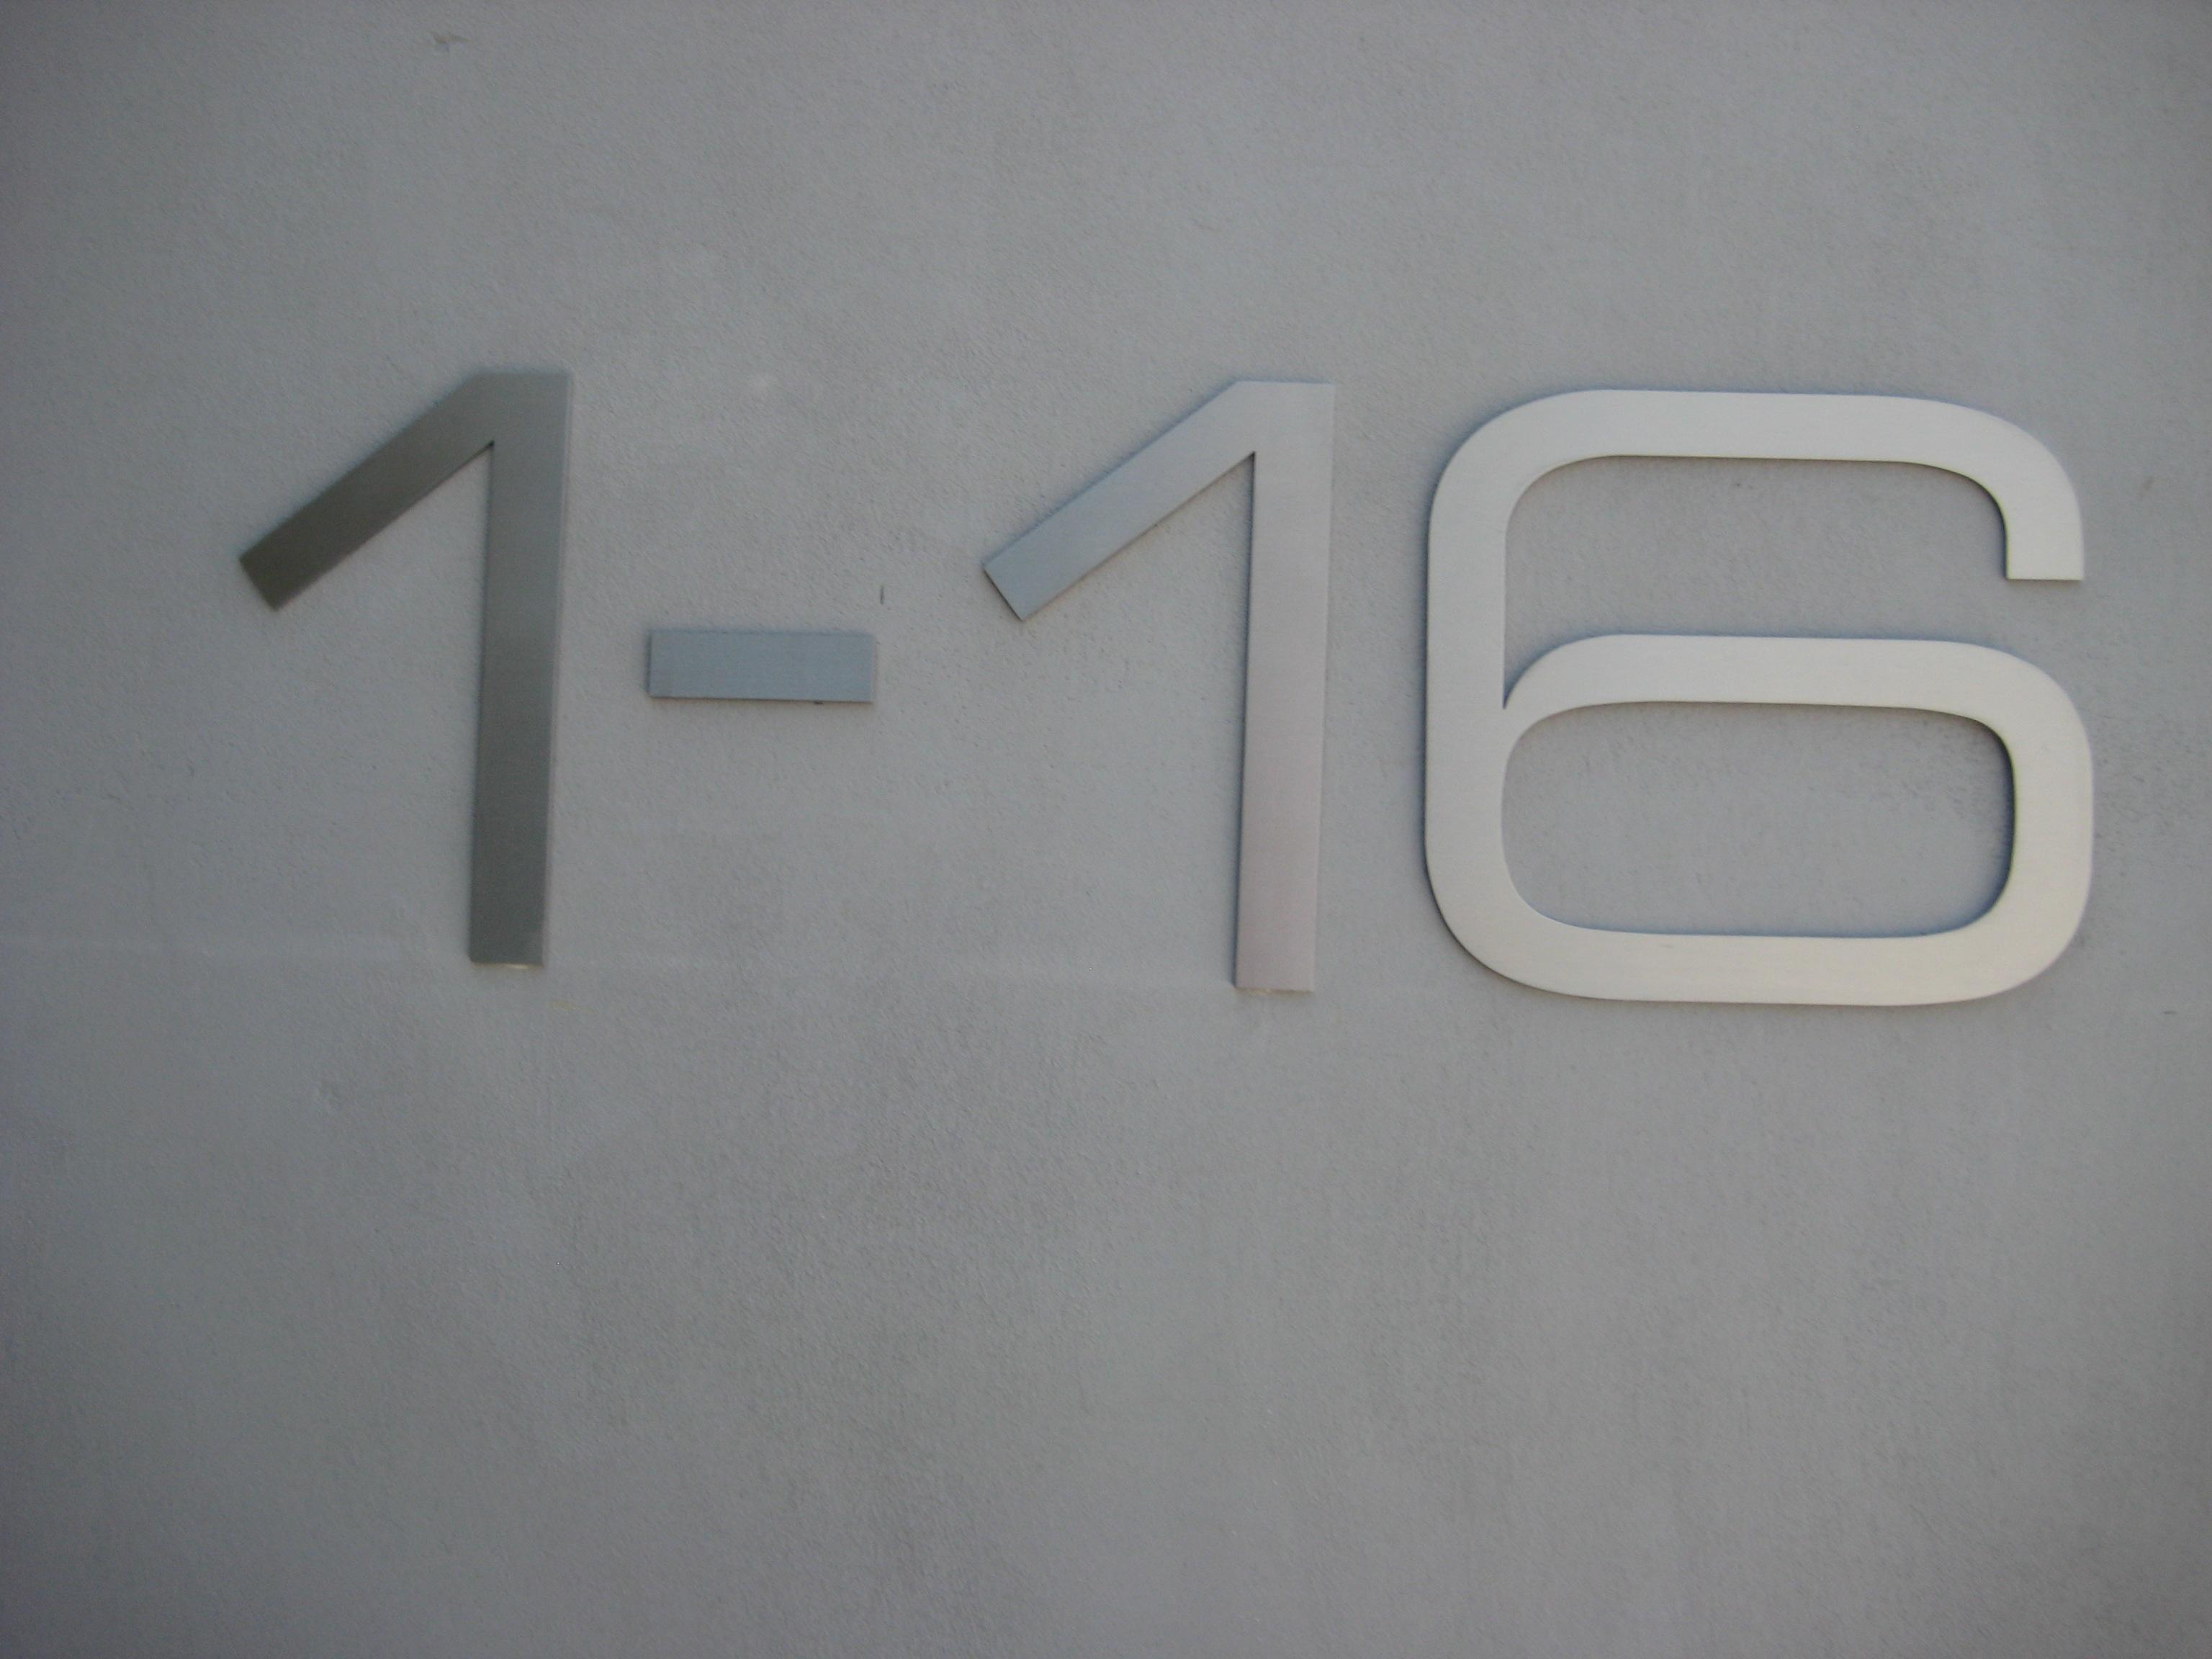 IMG_5381